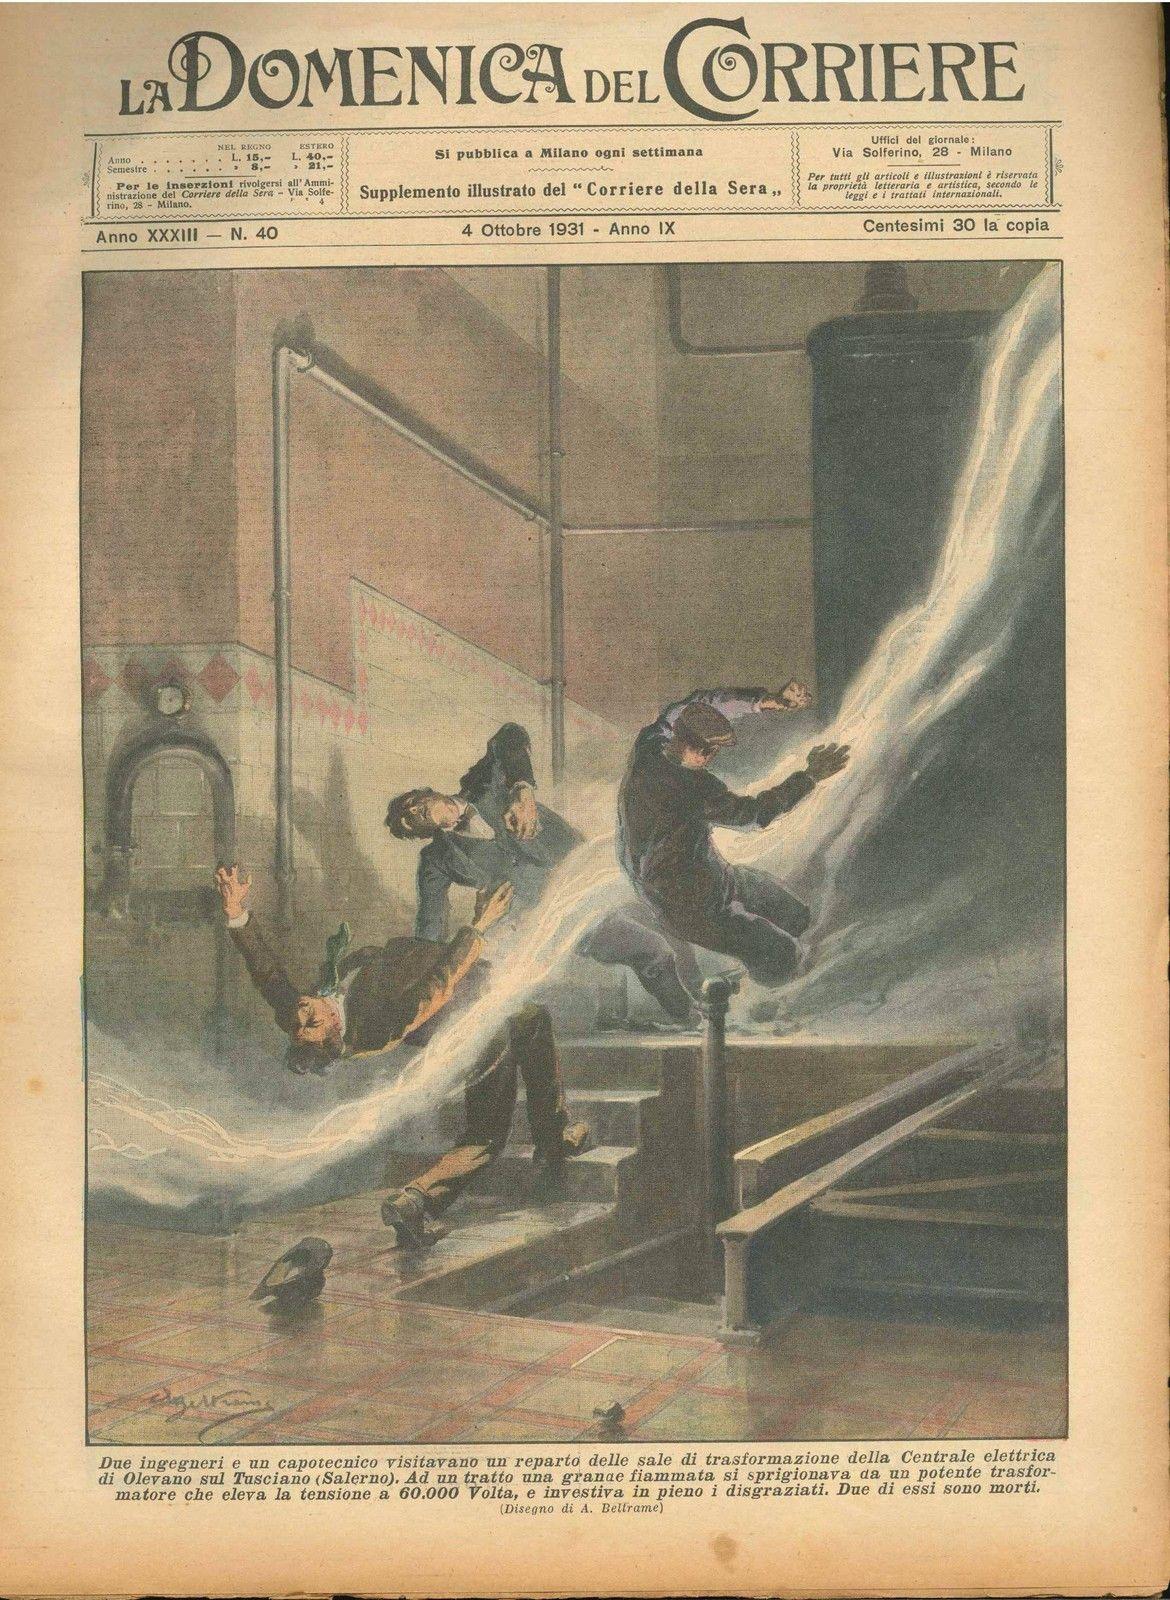 DOMENICA DEL CORRIERE N° 40 - 4 OTTOBRE 1931 - ILL.  A. BELTRAME